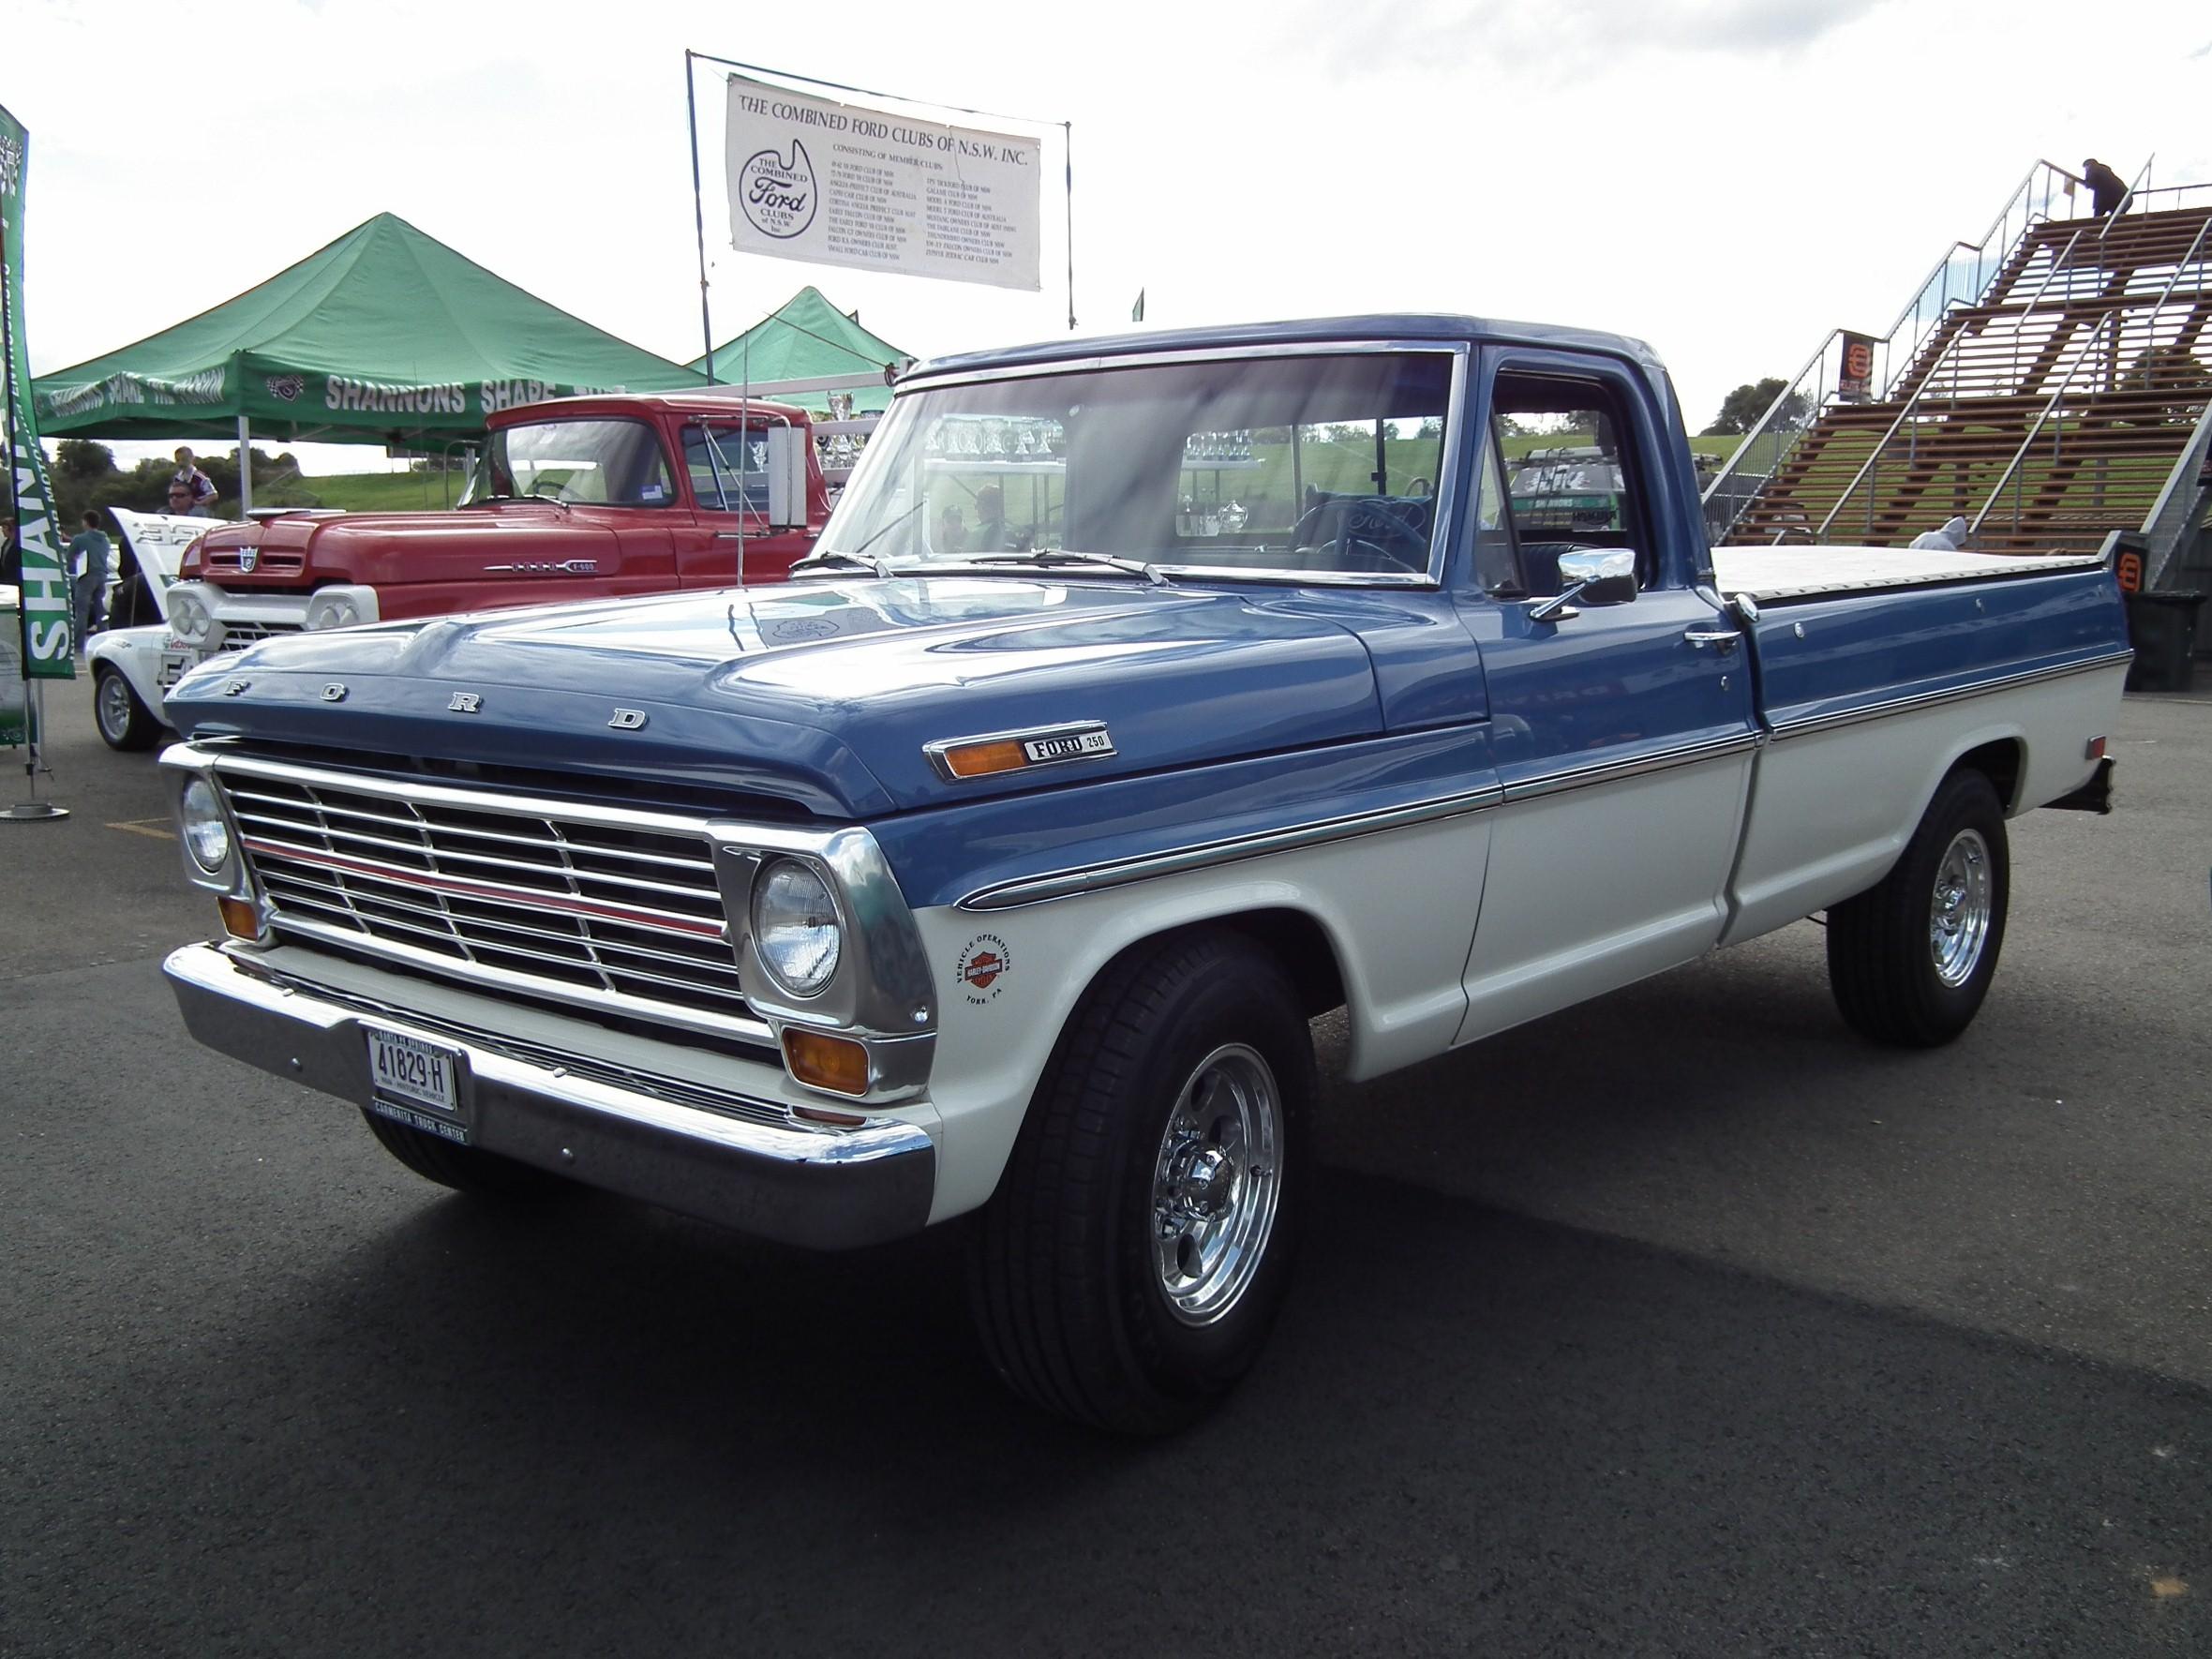 file 1969 ford f-250 custom cab pickup  7708140296  jpg